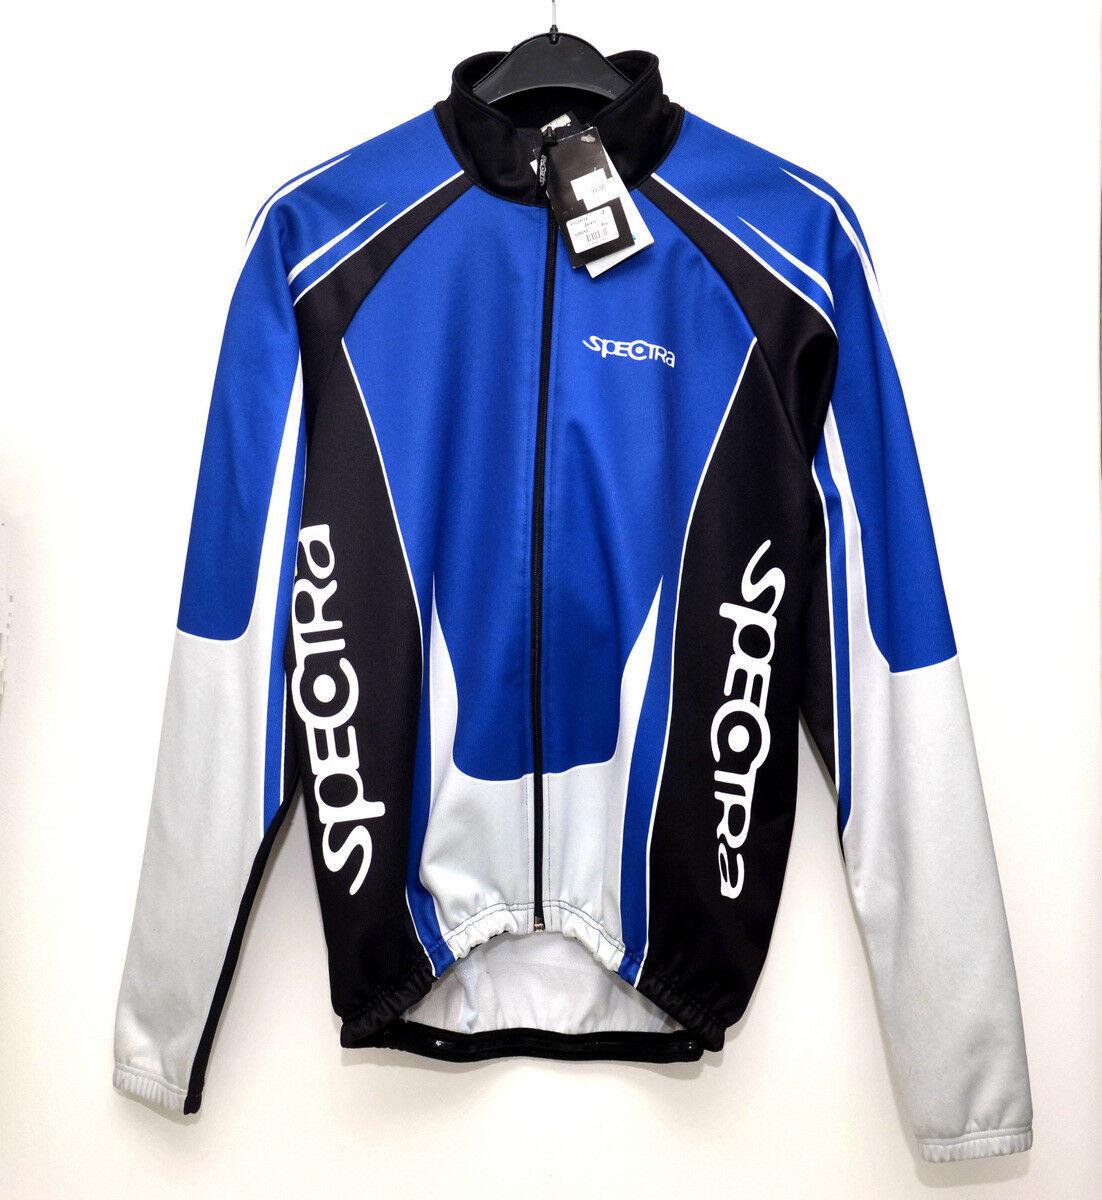 Veste coupevent vélo WindTex SPECTRA C9520314 blu Sprint Jacket Diuominiione L NEUF